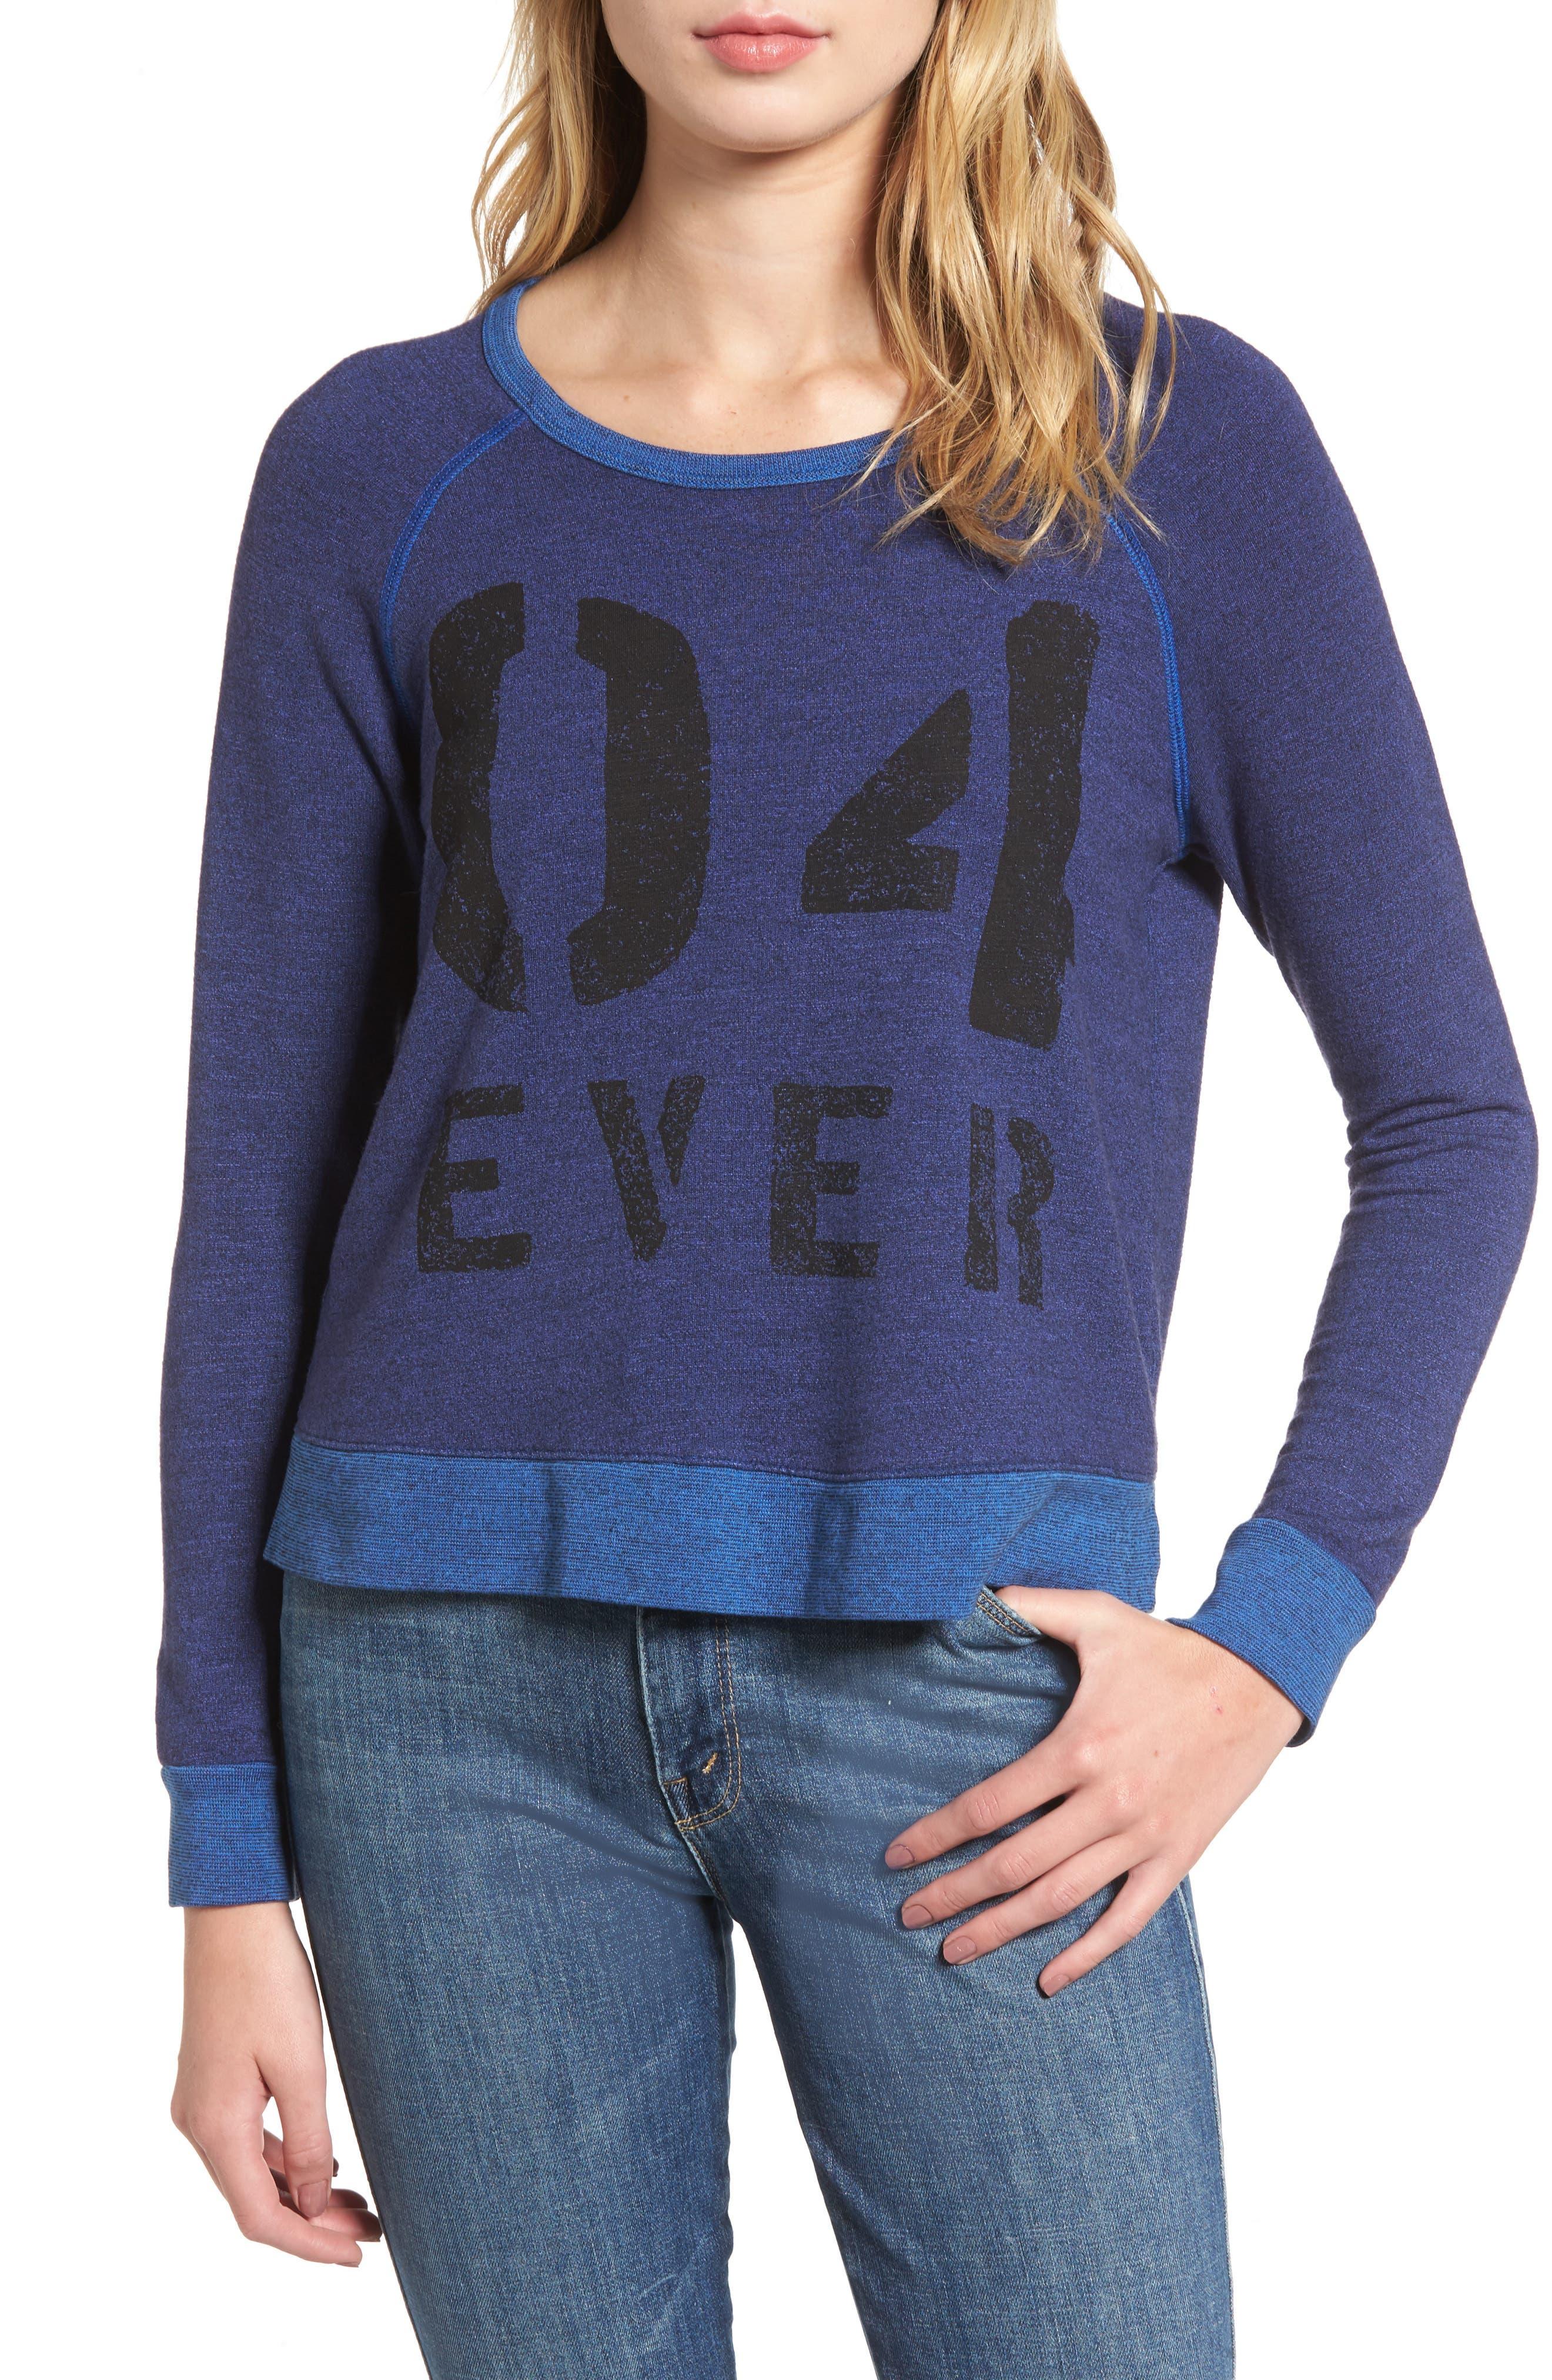 Sundry Love Forever Sweatshirt